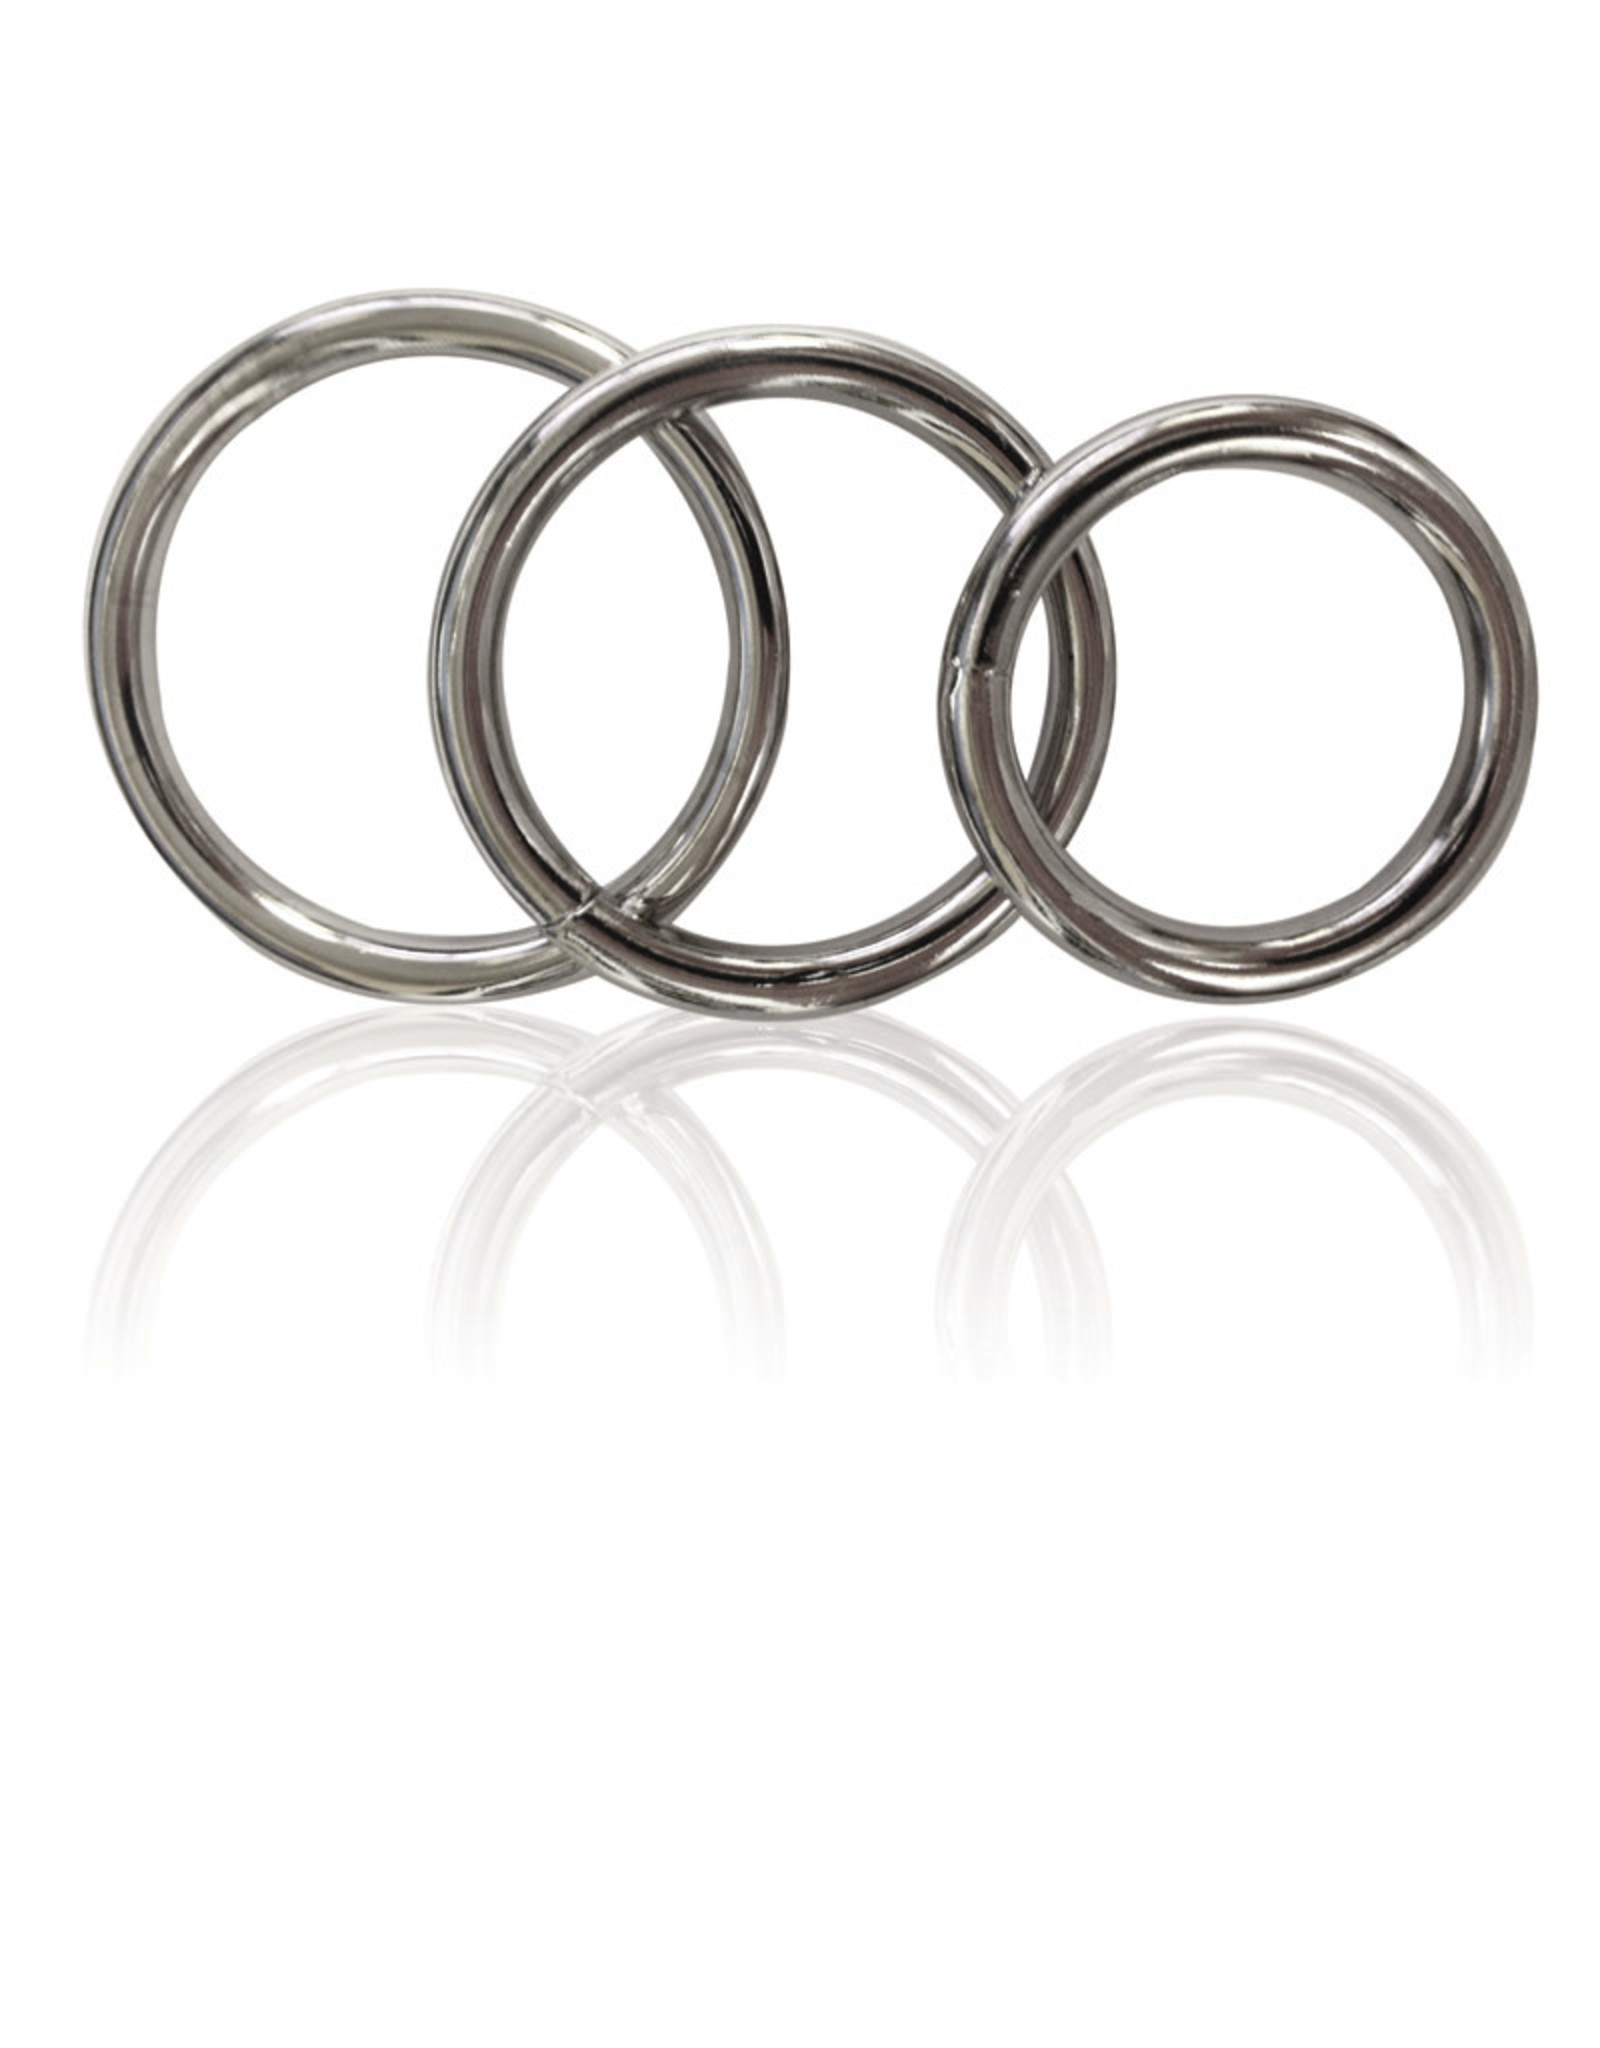 Sportsheets Manbound Metal Cock Ring 3 Piece Set